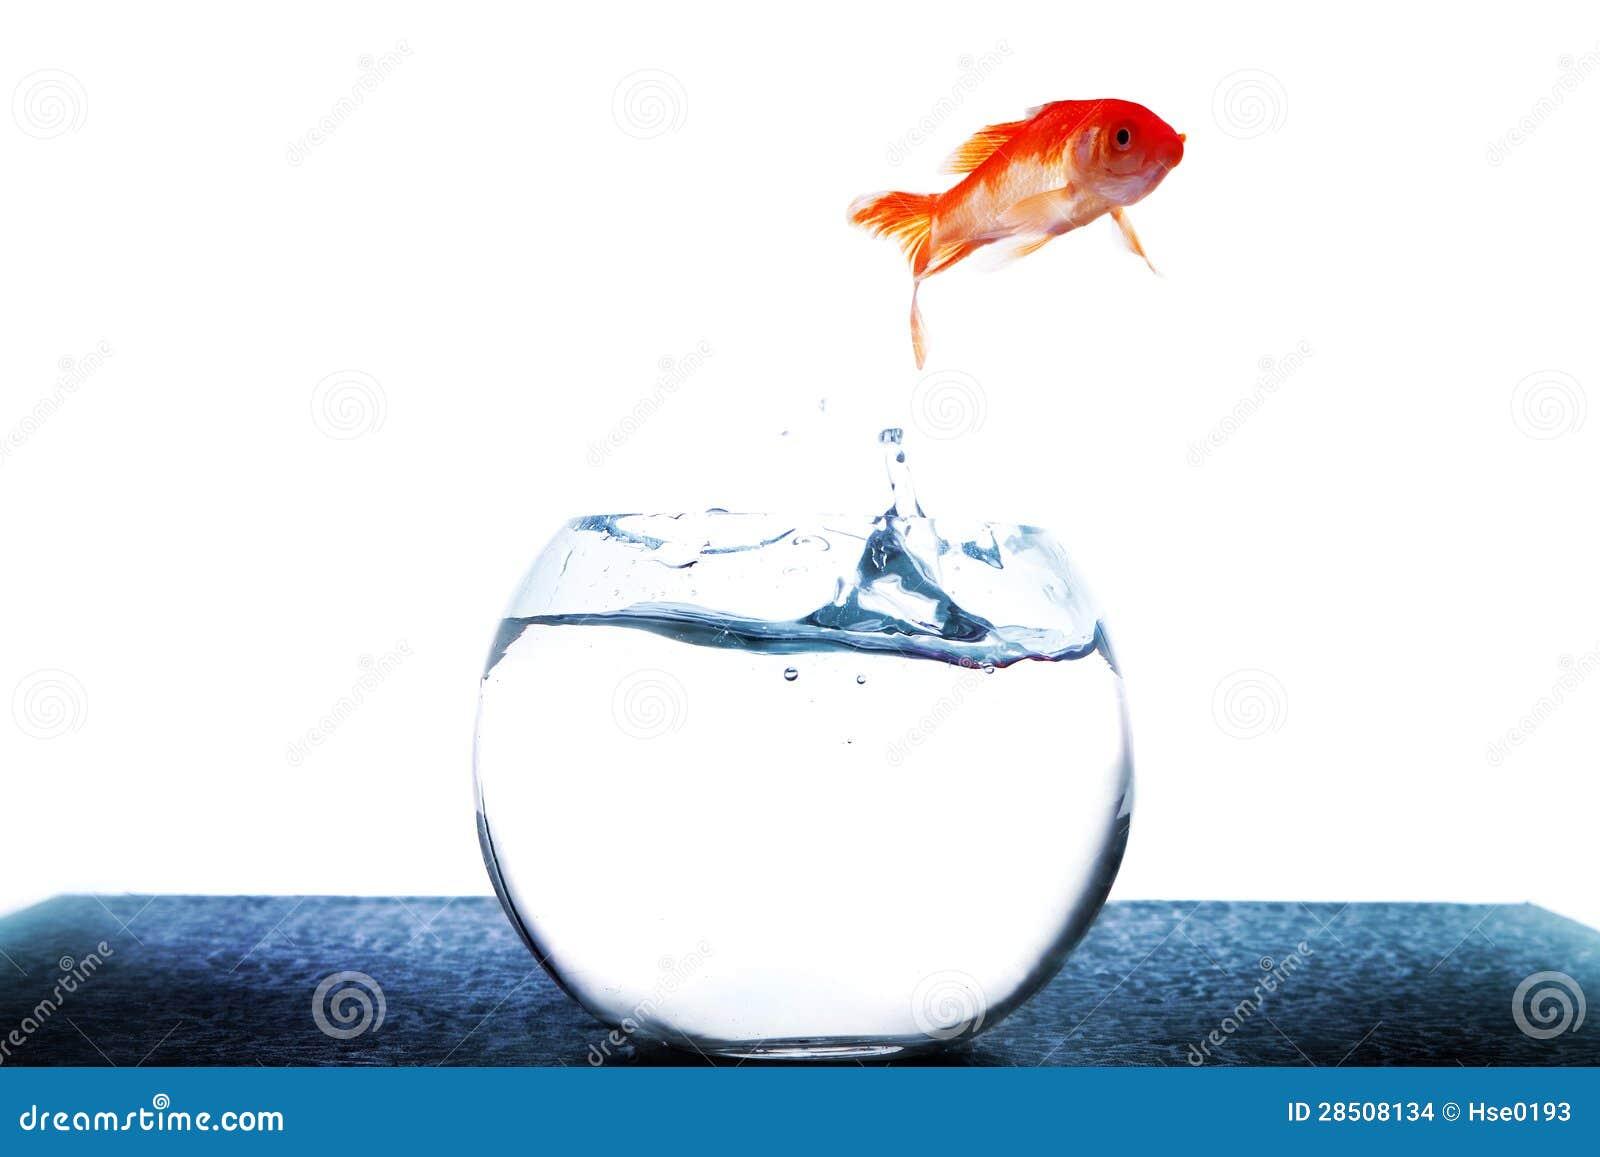 Goldfish Jumping Out Of Tank Stock Photo 28508134 Megapixl